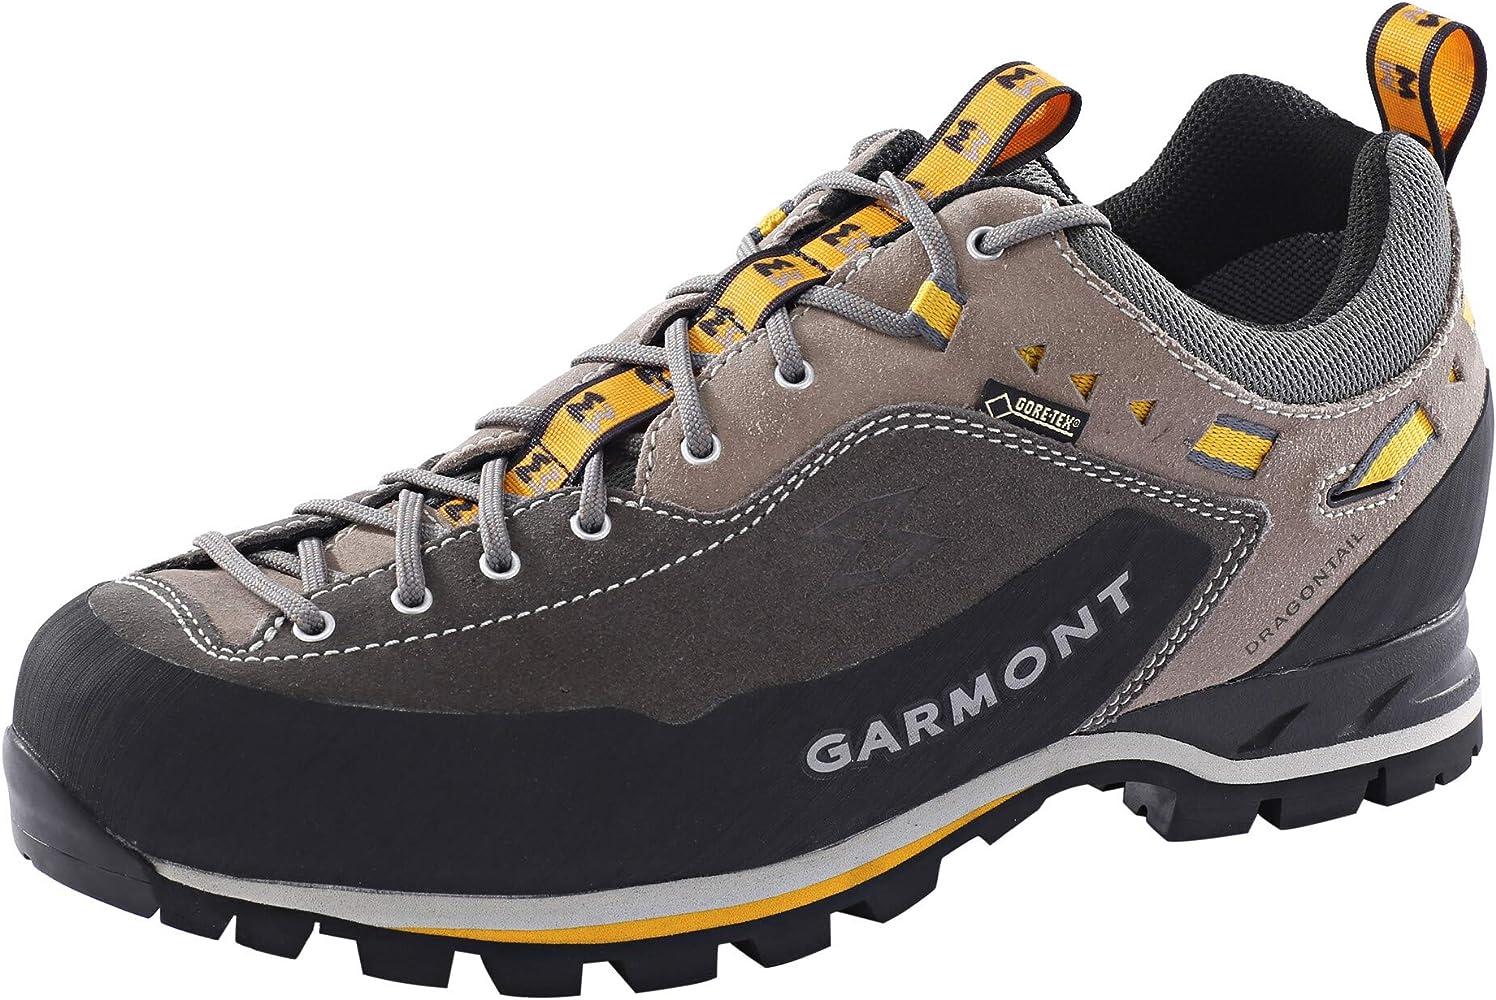 Garmont Dragontail MNT GTX Herren Zustiegsschuhe Herren grau Wanderschuhe Schuhe